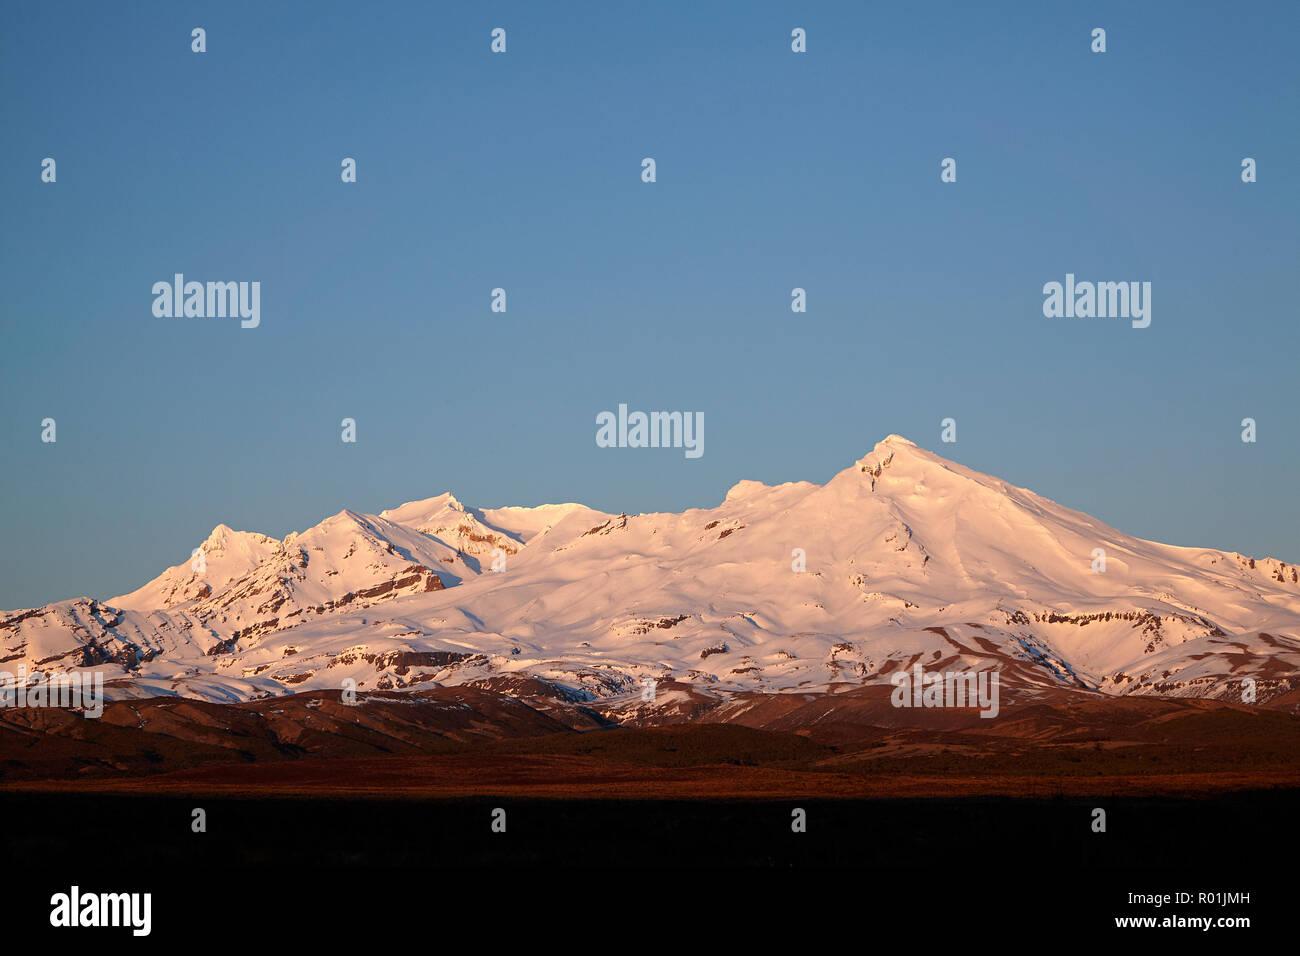 Early light on Mt Ruapehu, Tongariro National Park, Central Plateau, North Island, New Zealand - Stock Image